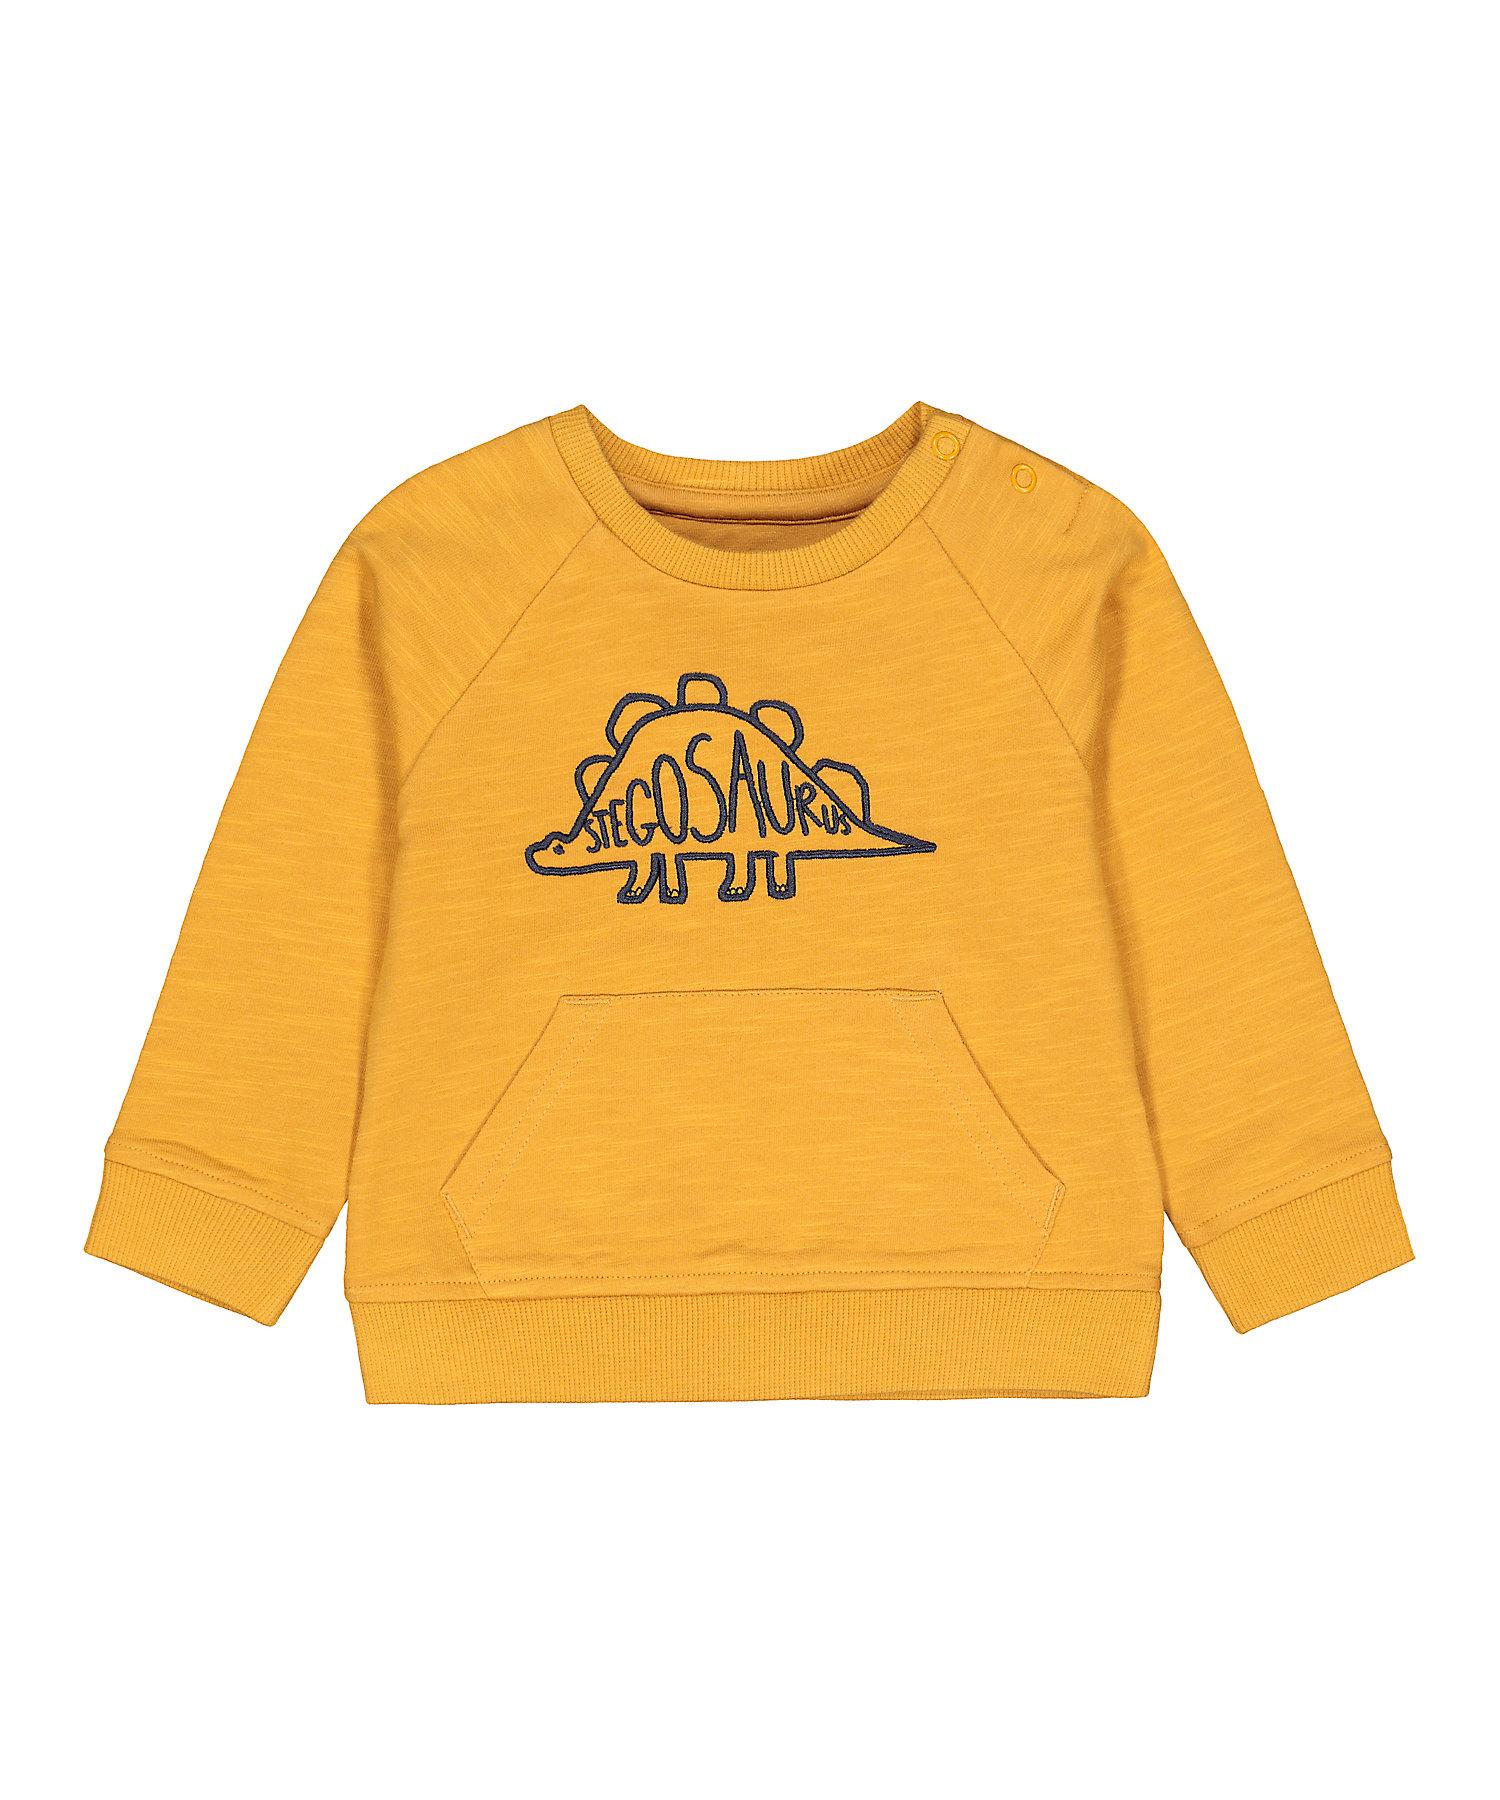 Mothercare   Boys Full Sleeves Sweatshirt Dino Embroidery - Yellow